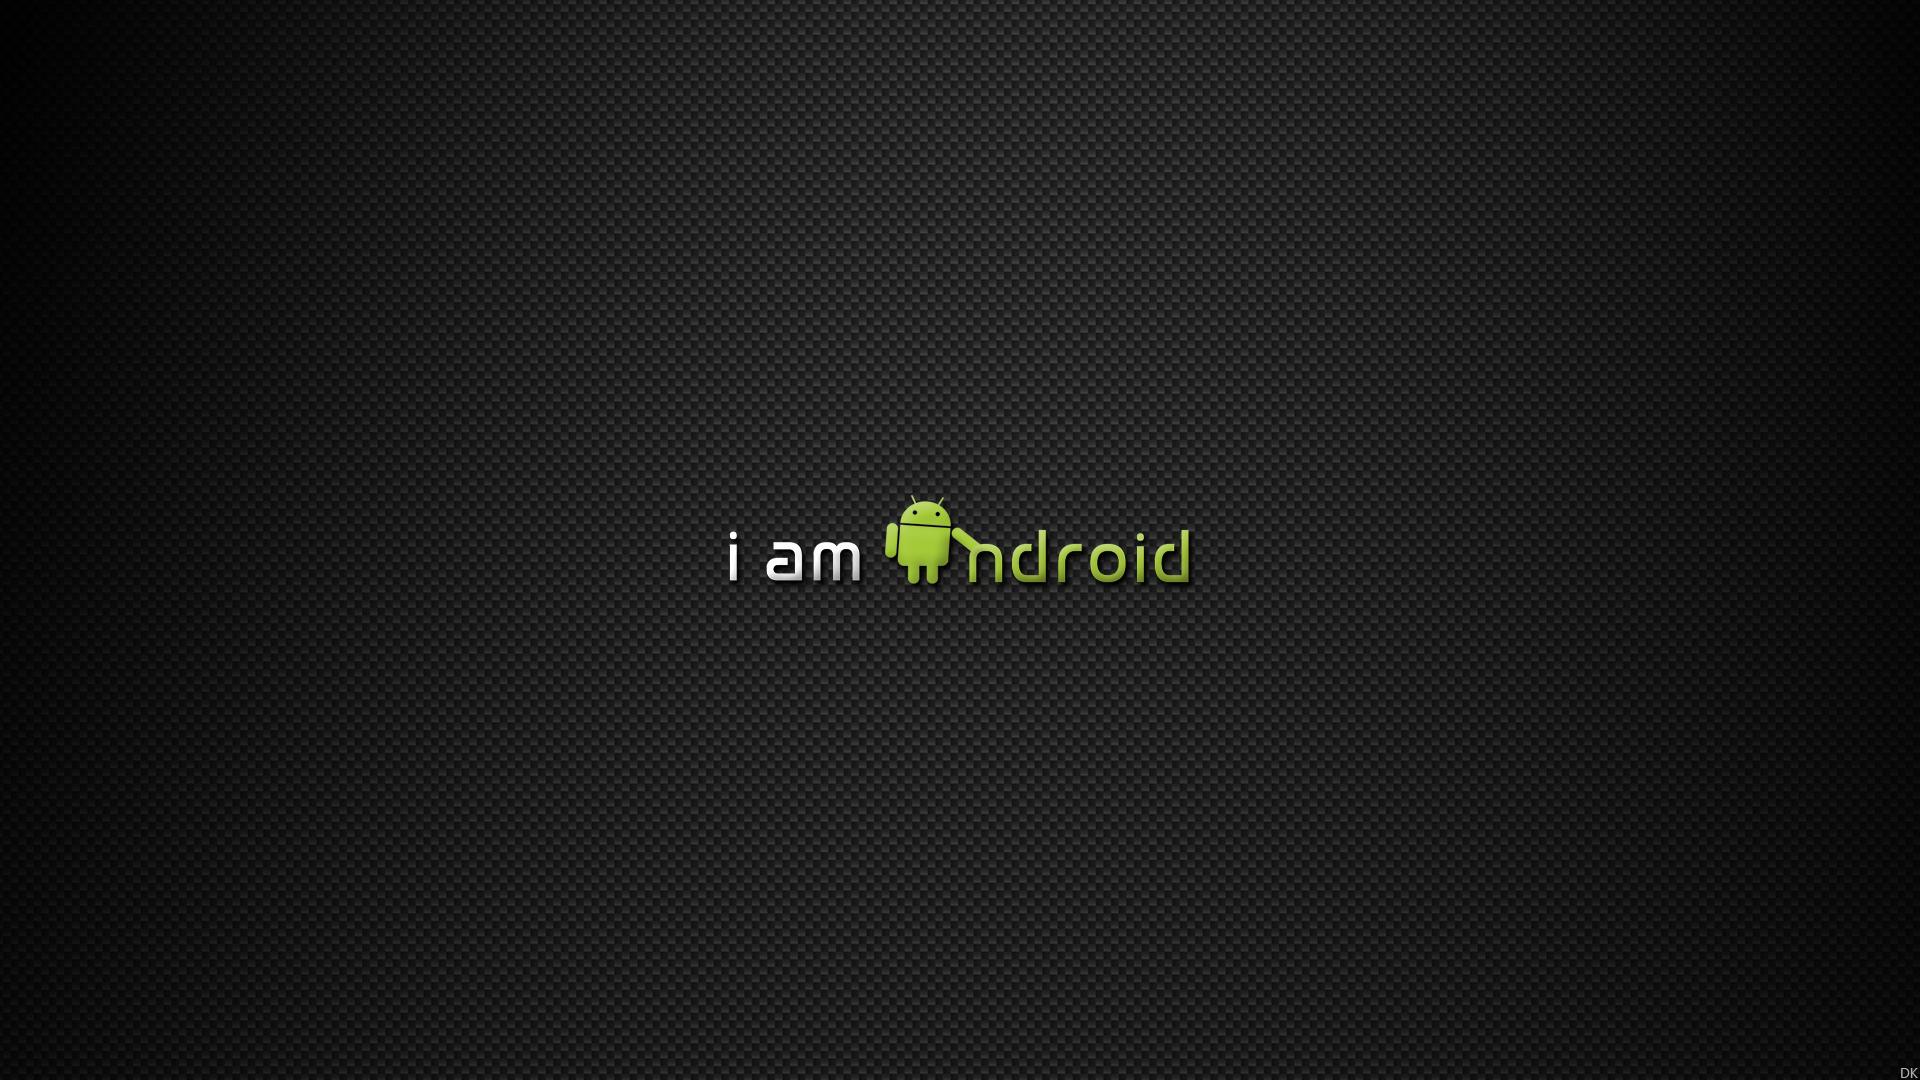 Android Logo Black Background 5392 Wallpaper Cool Walldiskpapercom 1920x1080